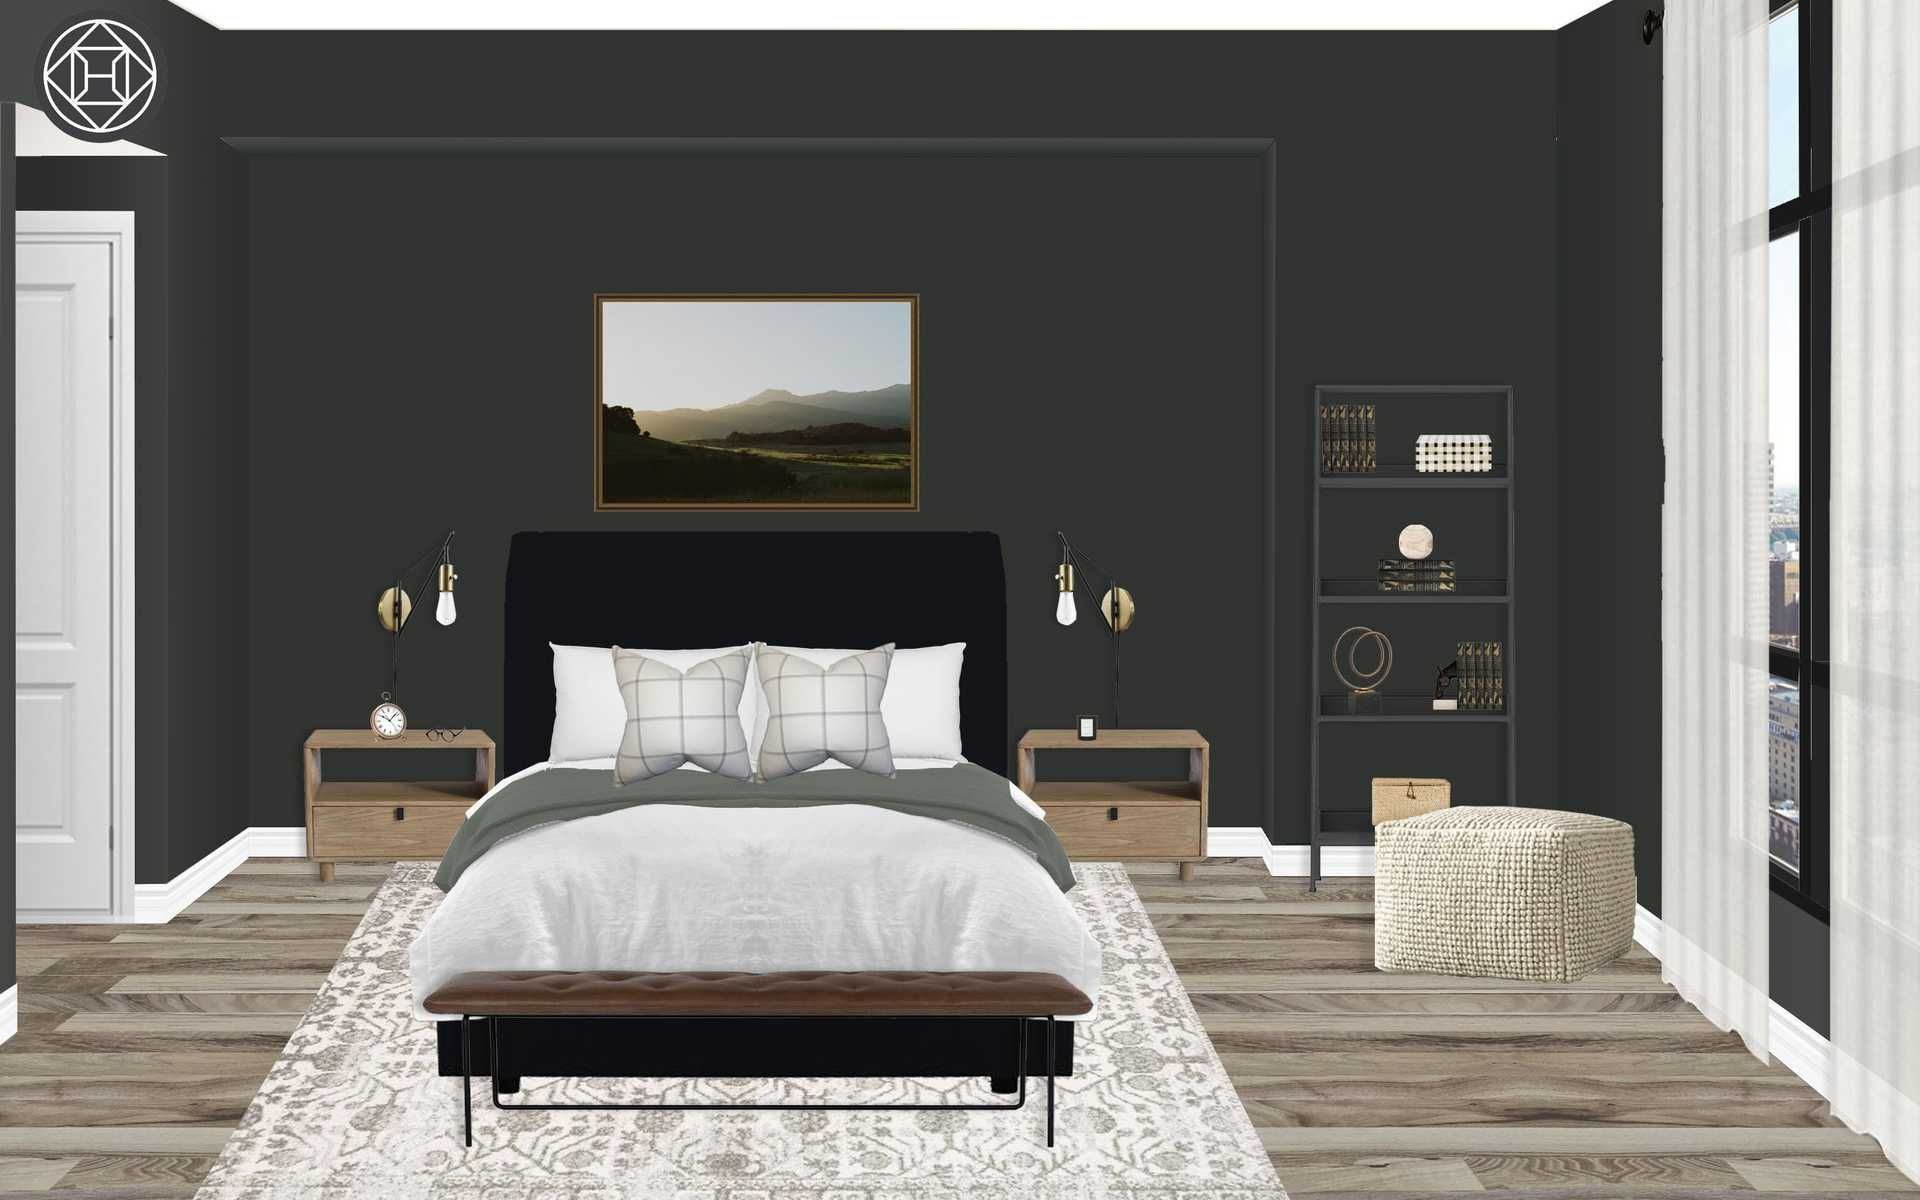 Modern Farmhouse Transitional Room Design By Havenly Interior Designer Victoria Transitional Bedroom Design Interior Design Online Interior Design